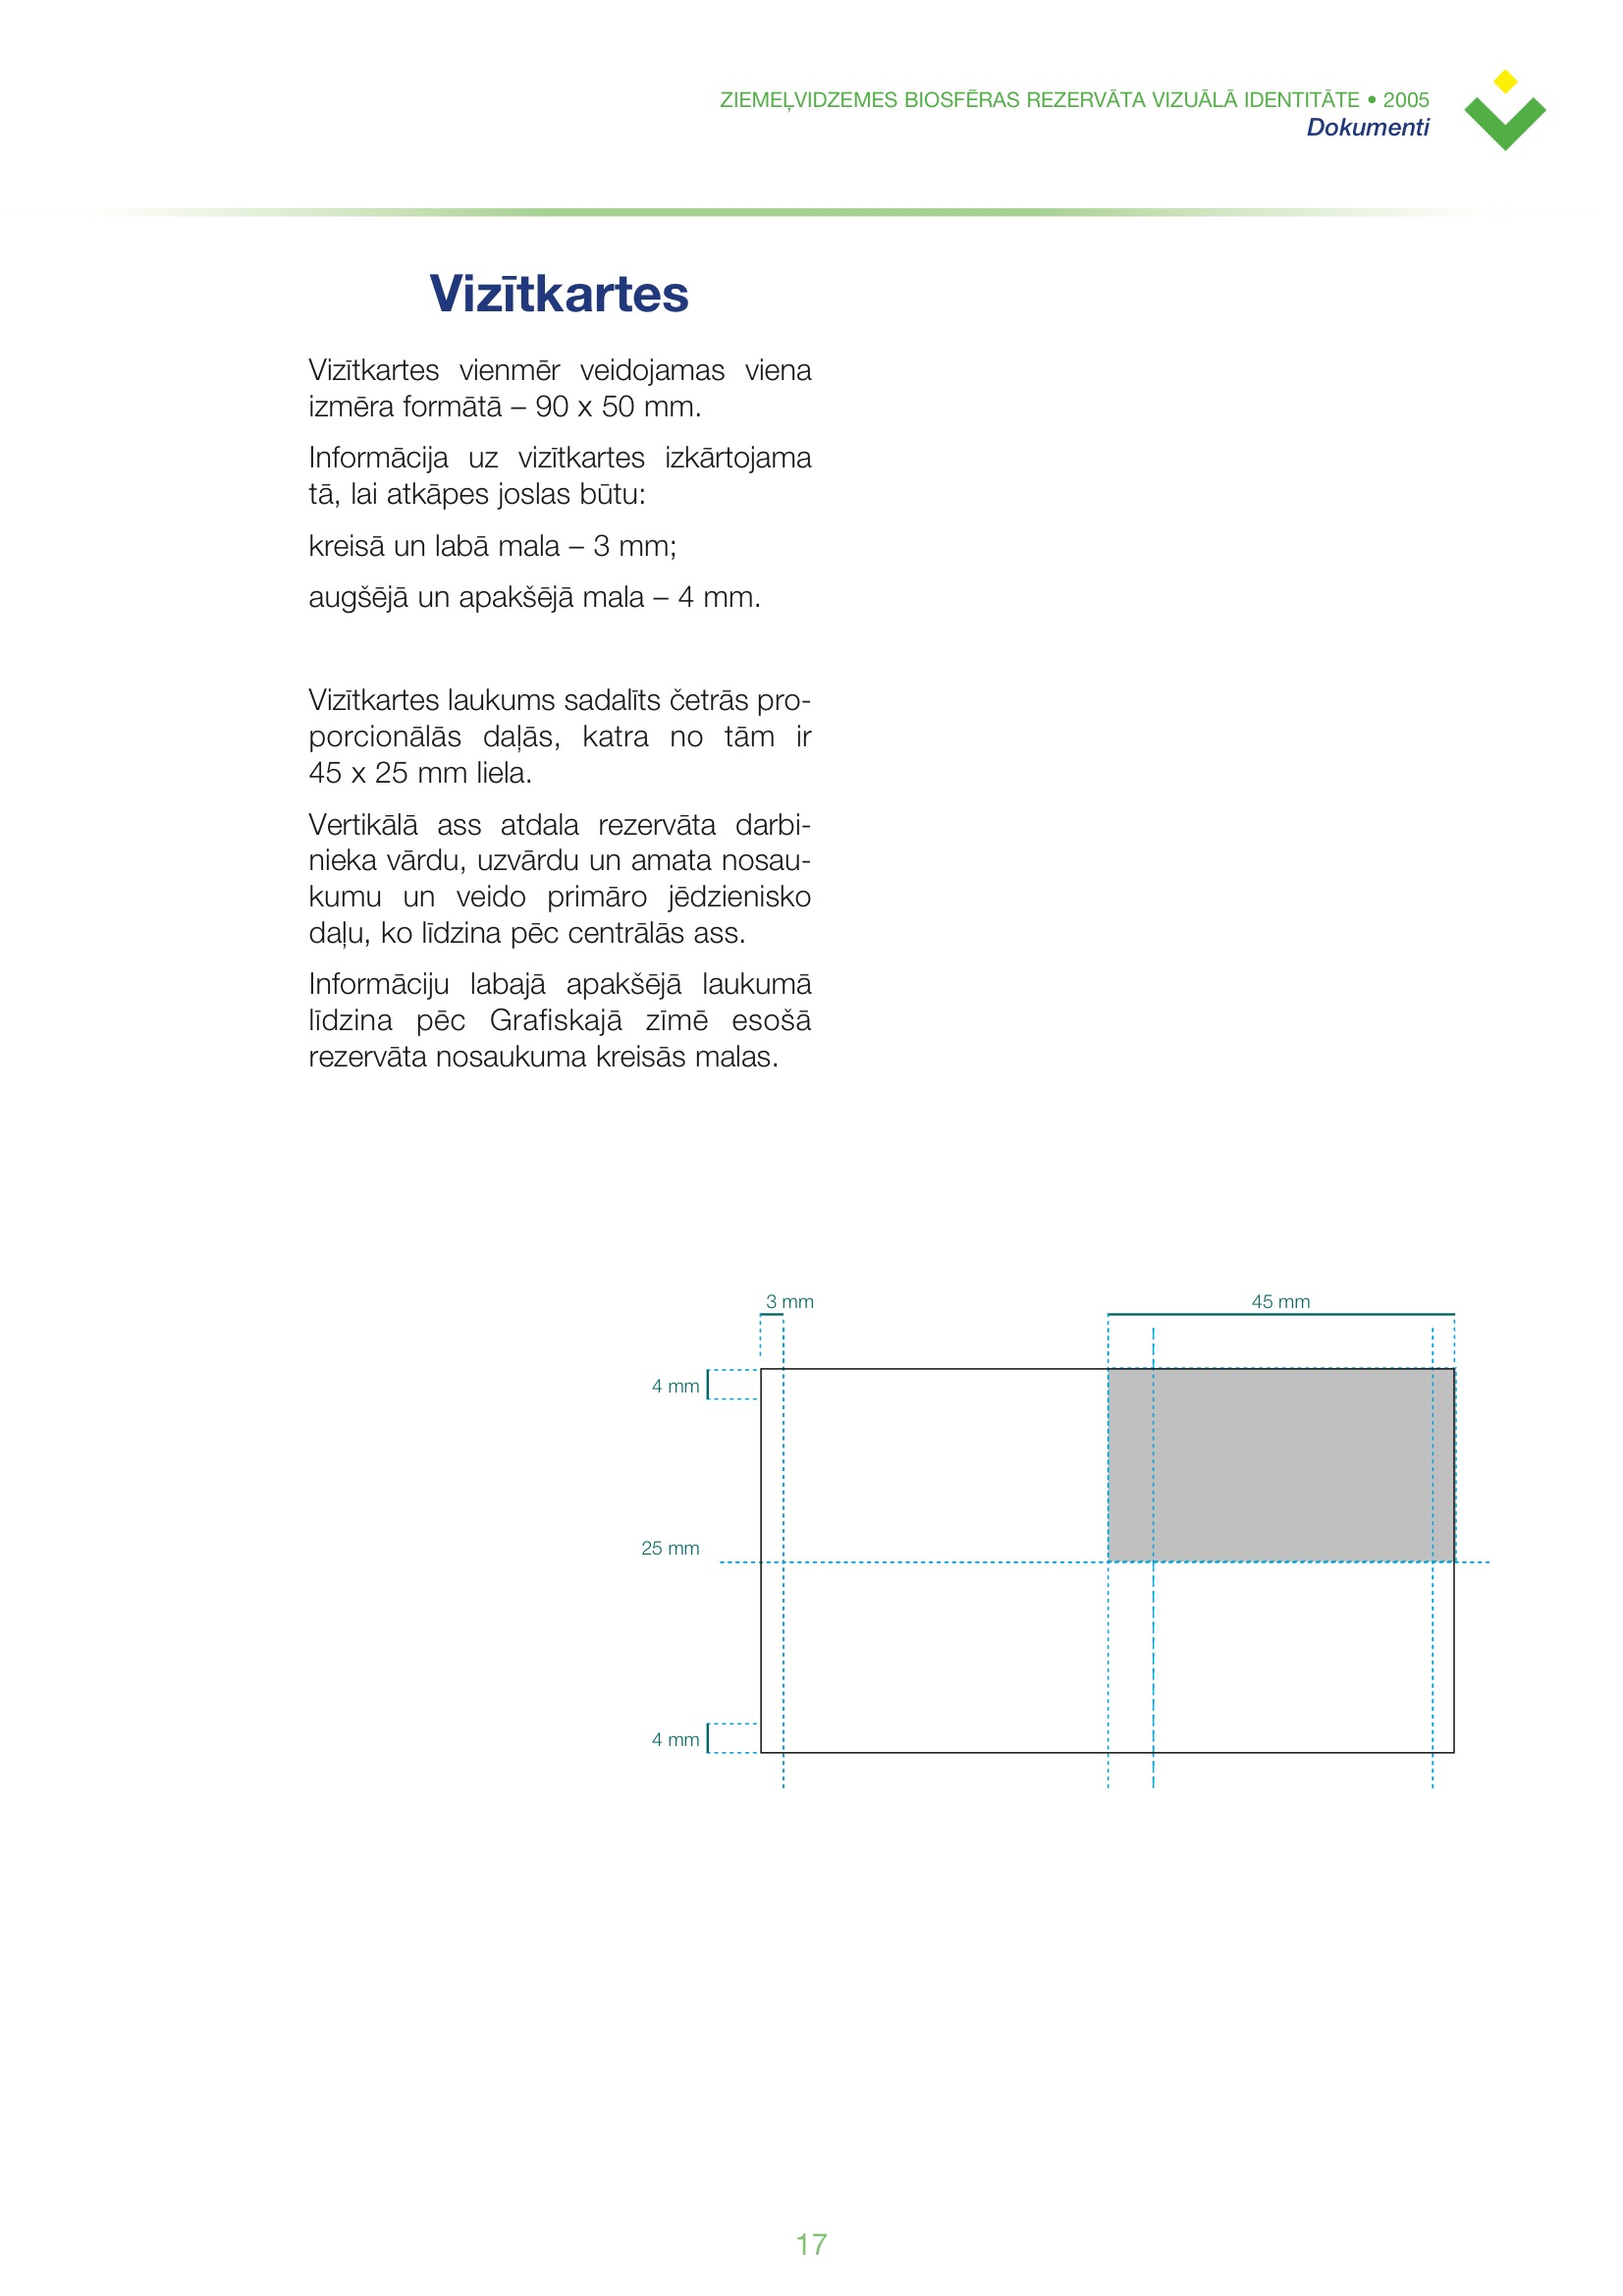 ZBR-rokasgramata_RGB 17